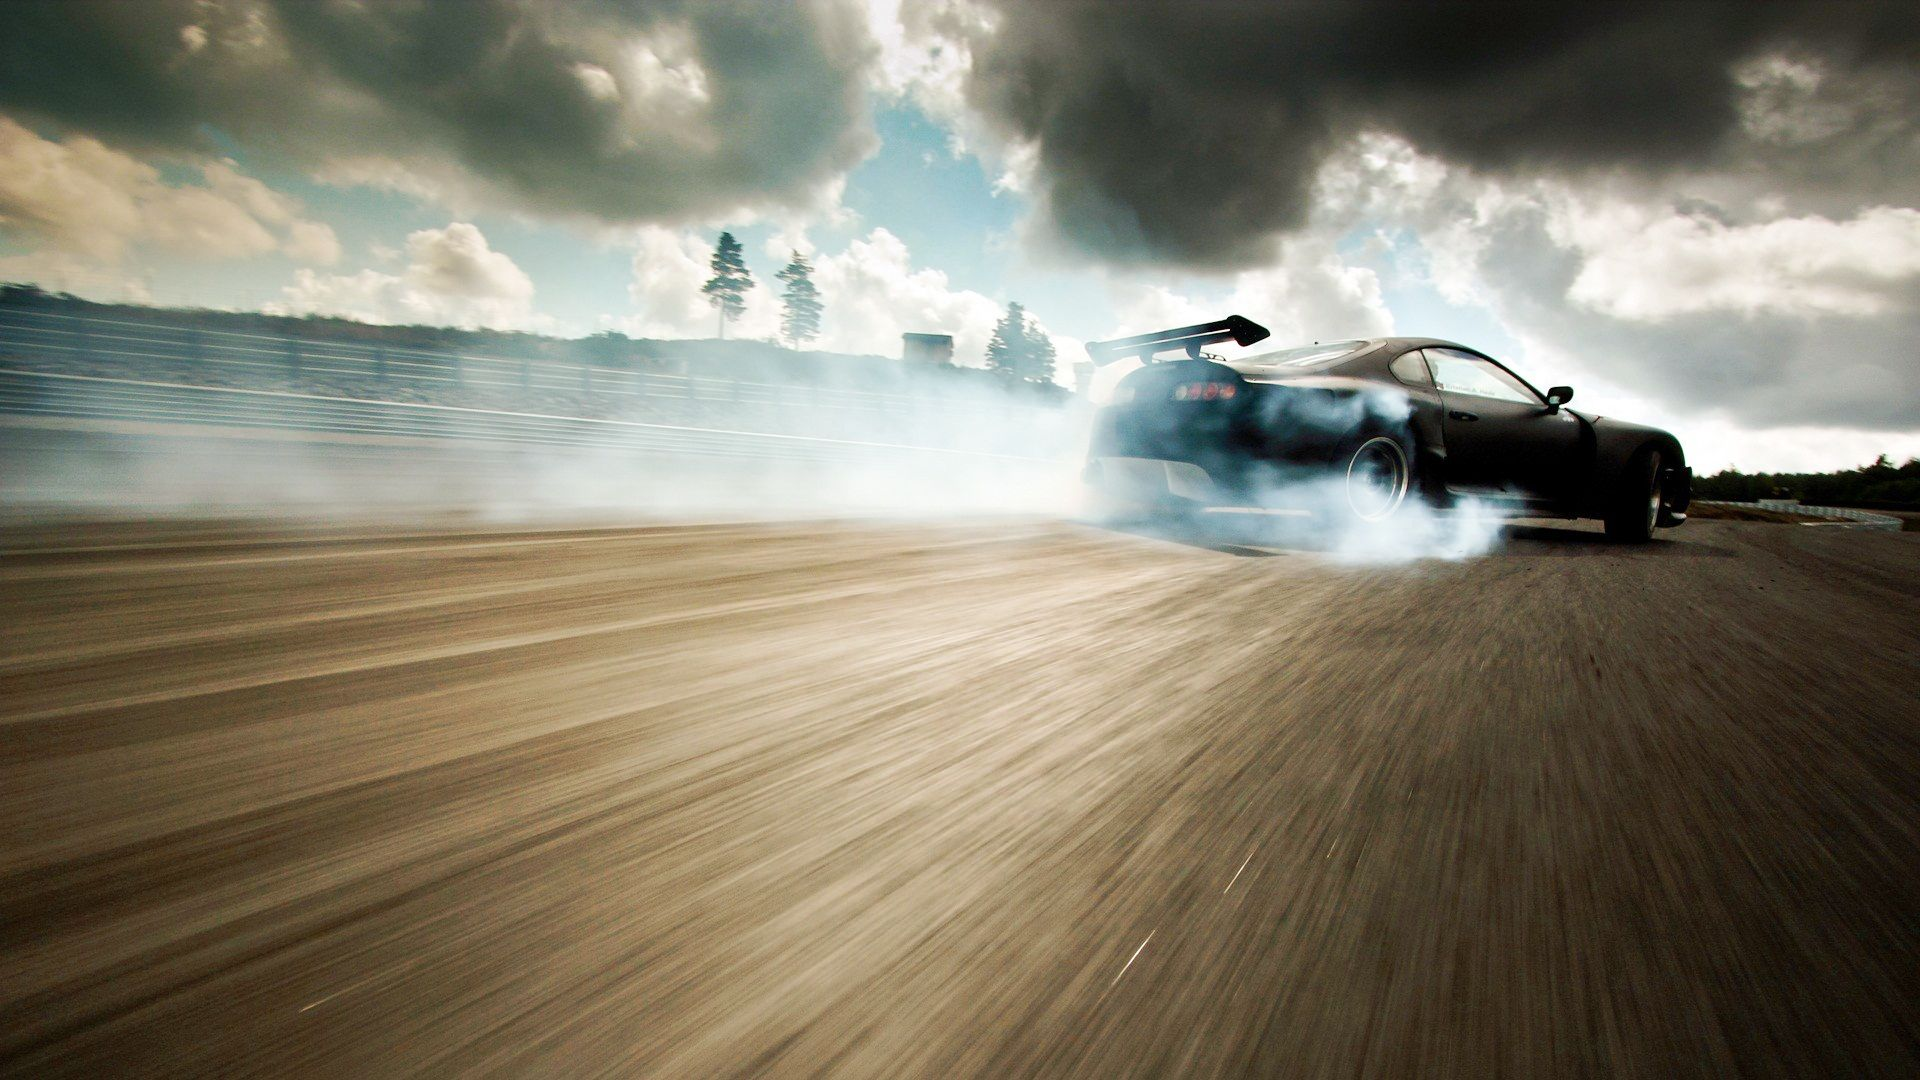 Look At That Drift D Car Wallpapers Drifting Cars Drifting